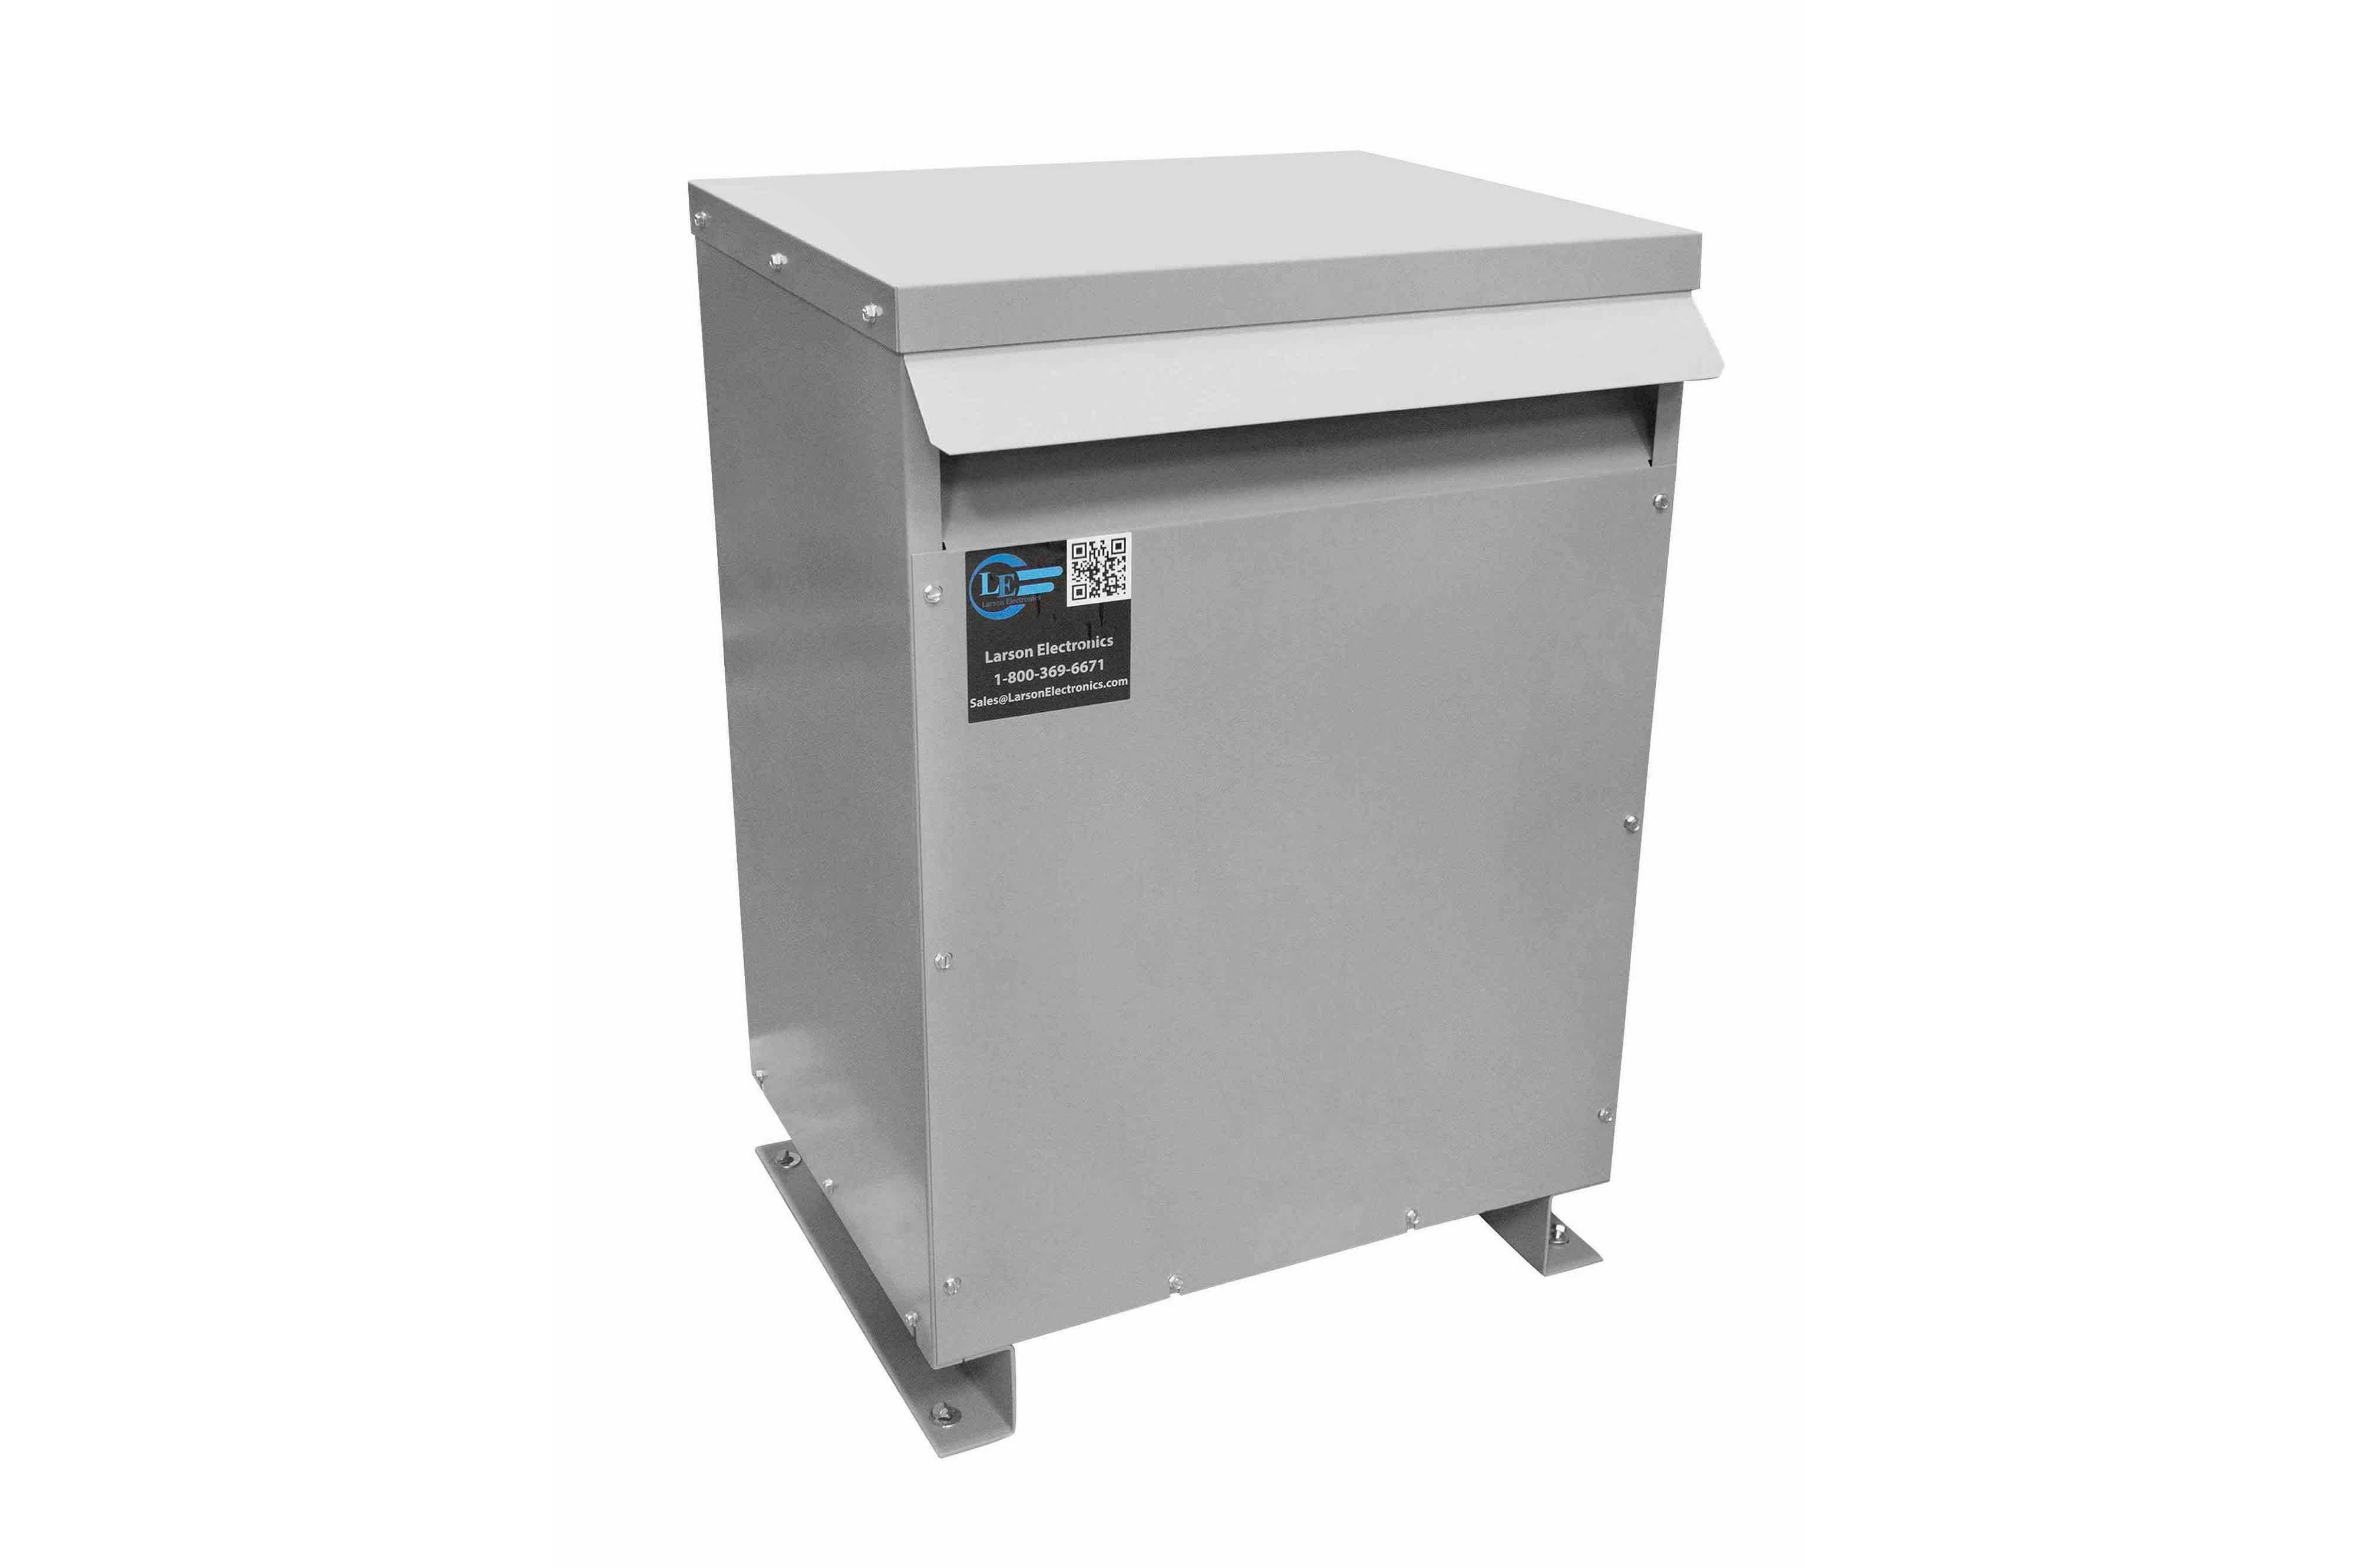 32.5 kVA 3PH Isolation Transformer, 480V Wye Primary, 400V Delta Secondary, N3R, Ventilated, 60 Hz